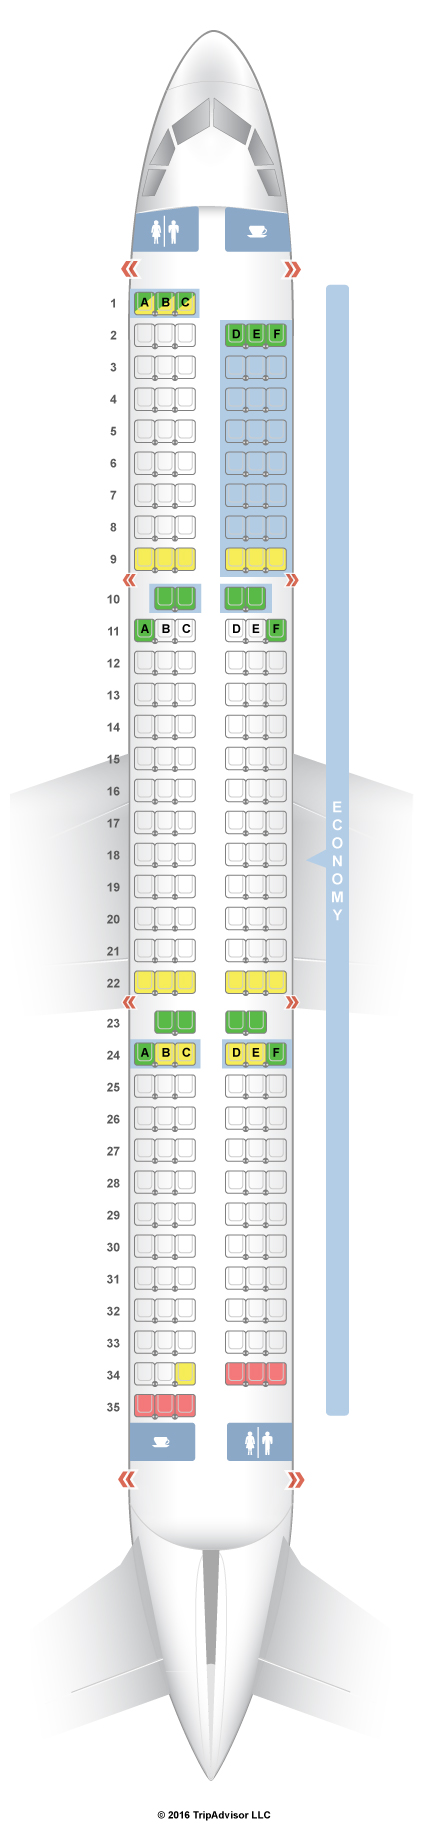 Seat Guru Air Nz Brokeasshomecom - Us airways a321 seat map